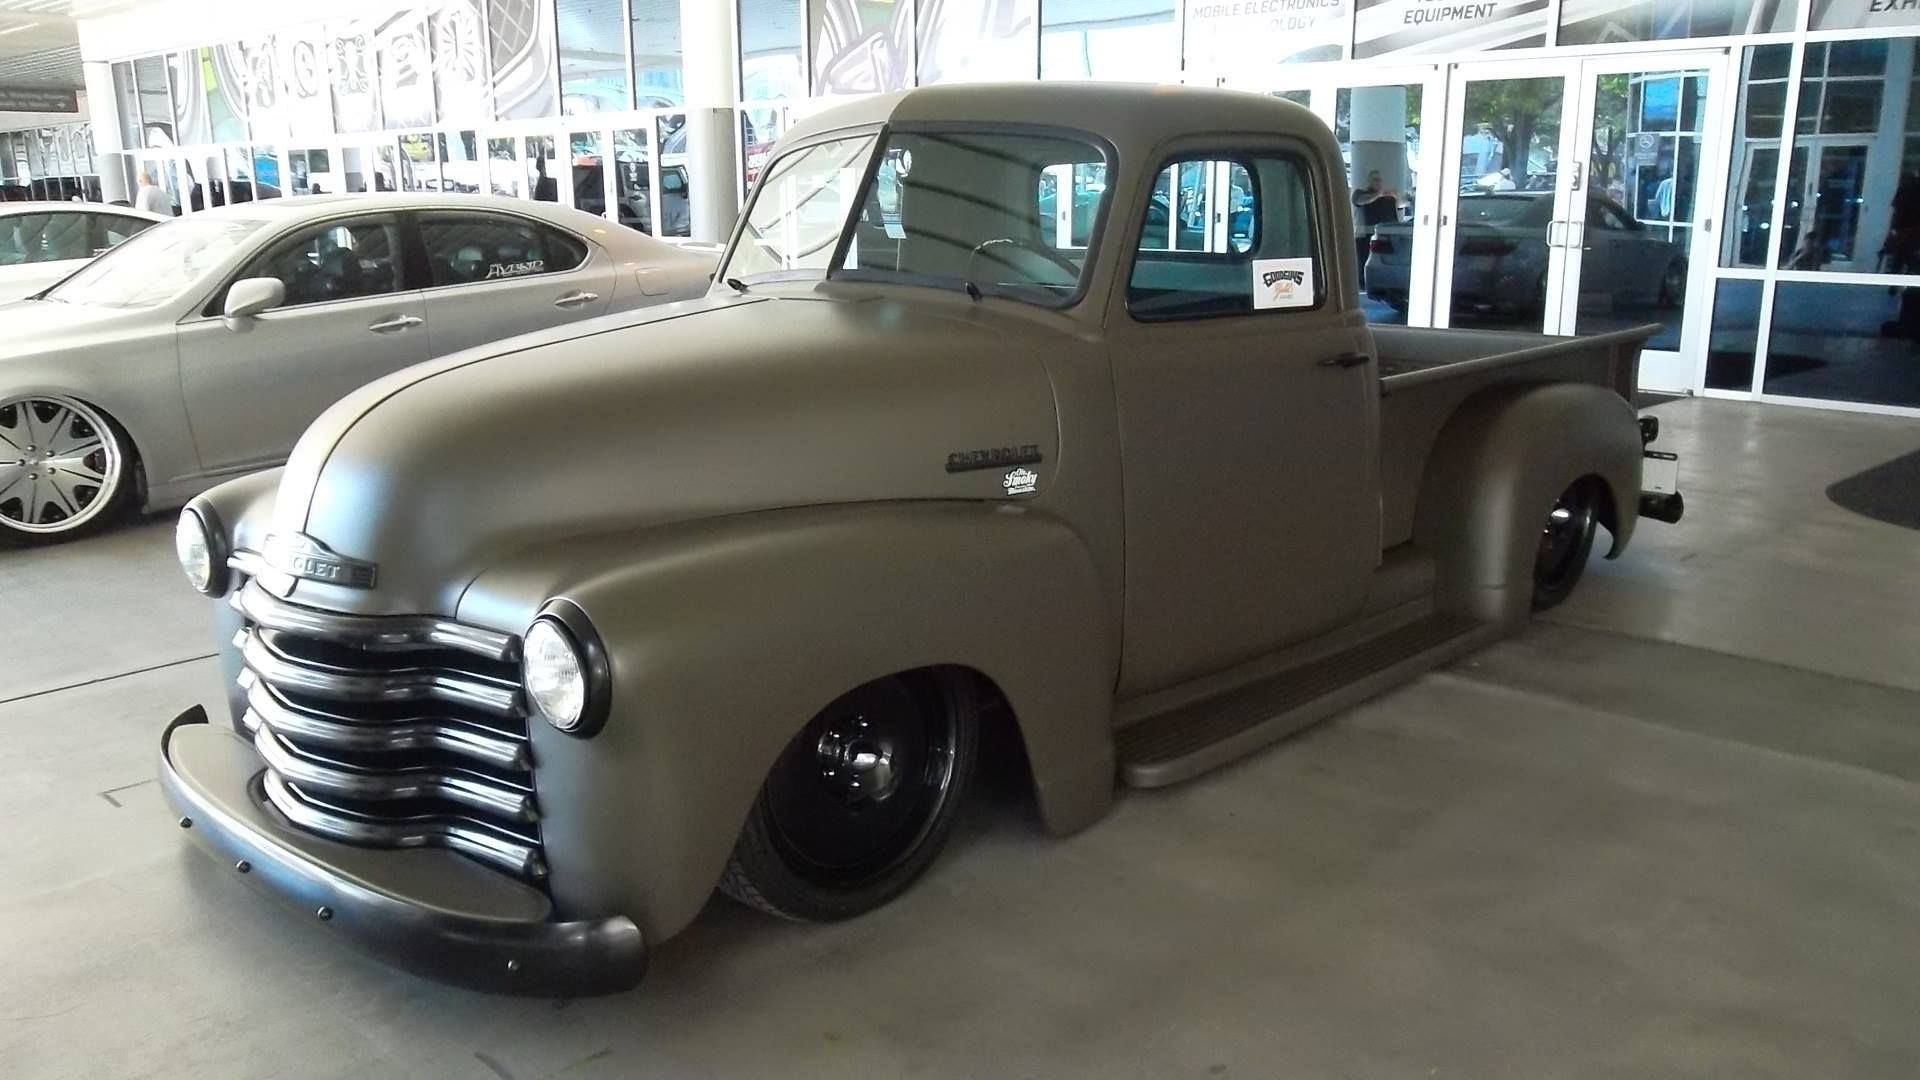 chevy chevrolet advanced design pickup truck slammed. Black Bedroom Furniture Sets. Home Design Ideas